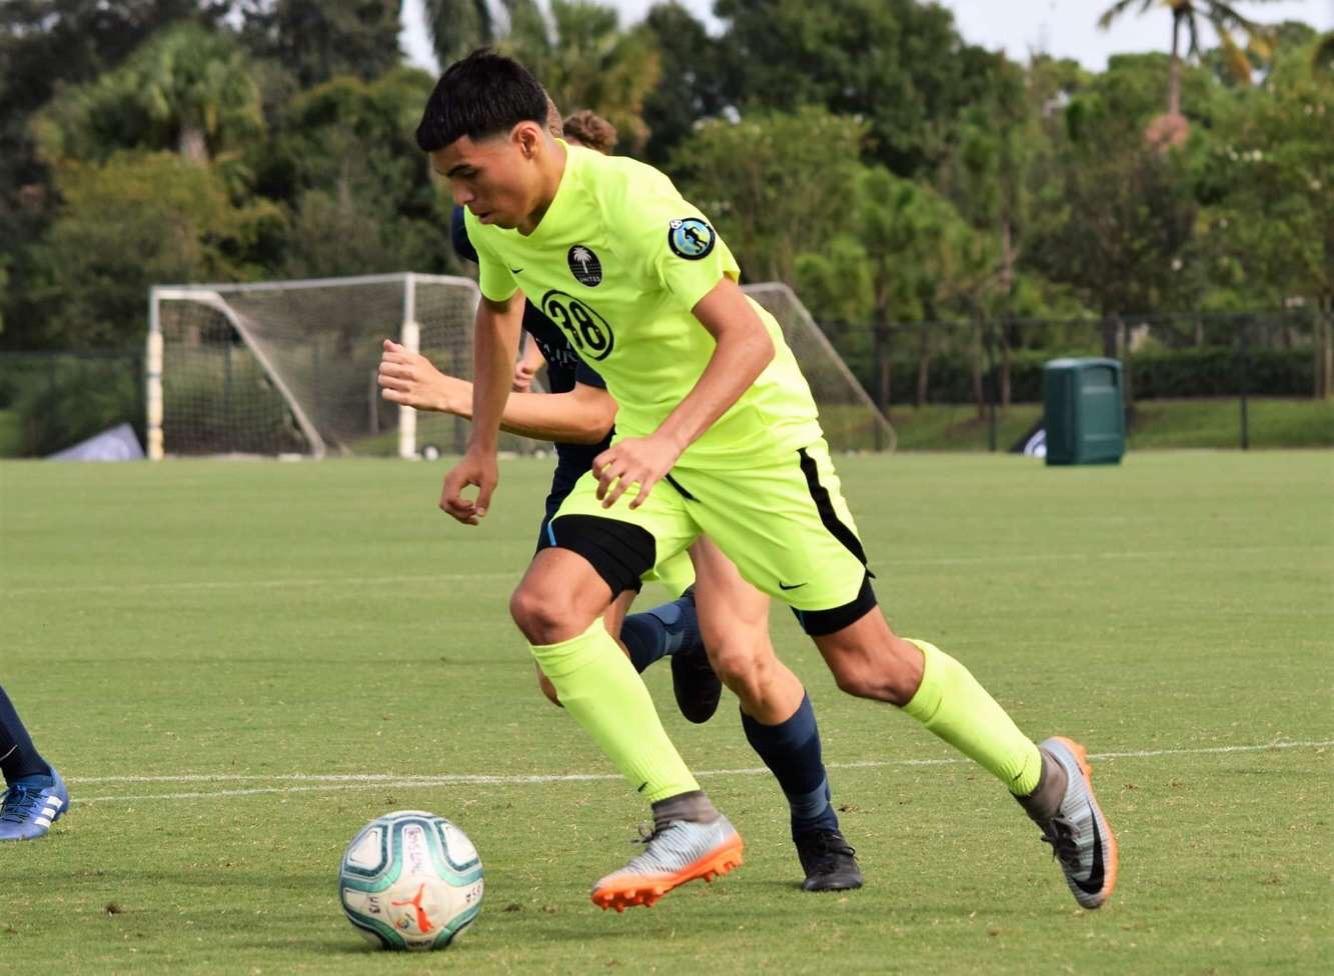 Dario Gomez plays for Palm Beach United, a soccer club based in South Florida.